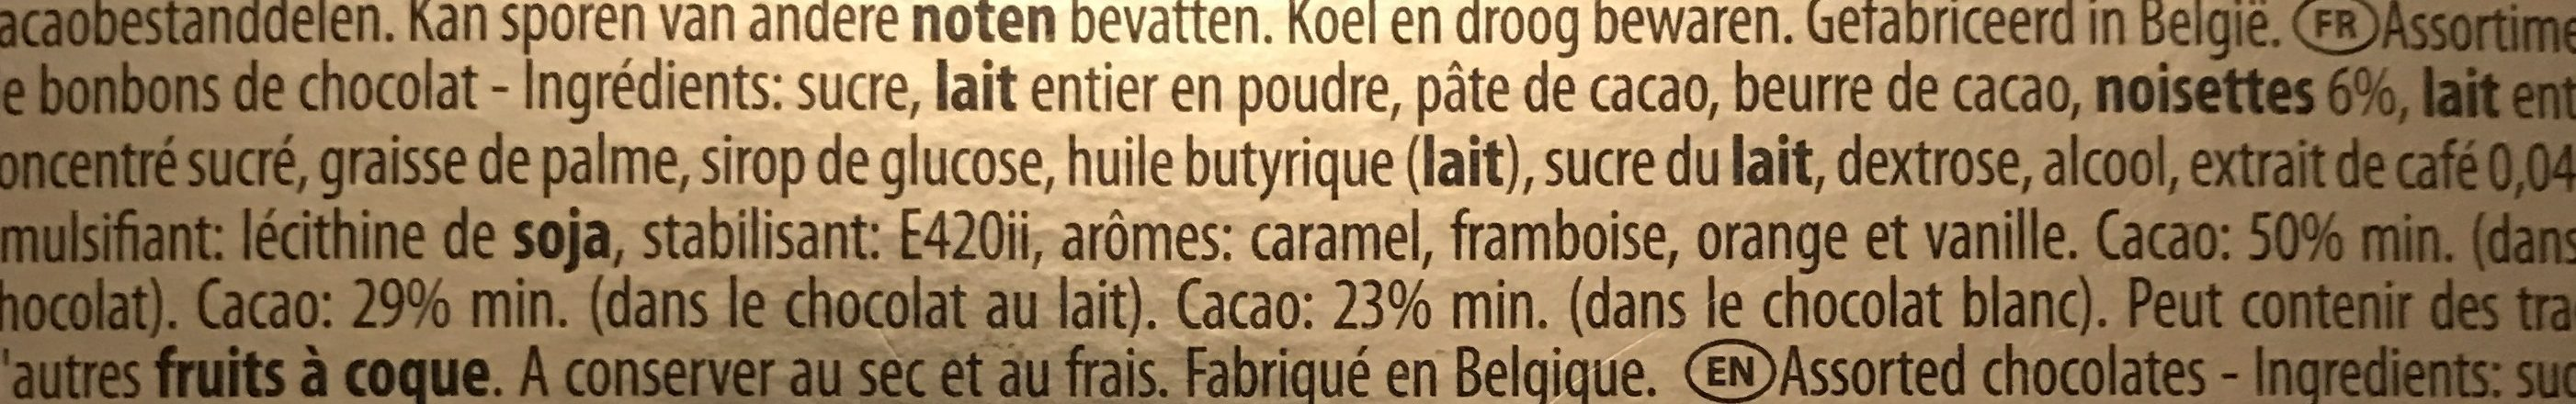 Belgium Hamlet Assortment Chocolates In Golden Box - Ingrédients - fr